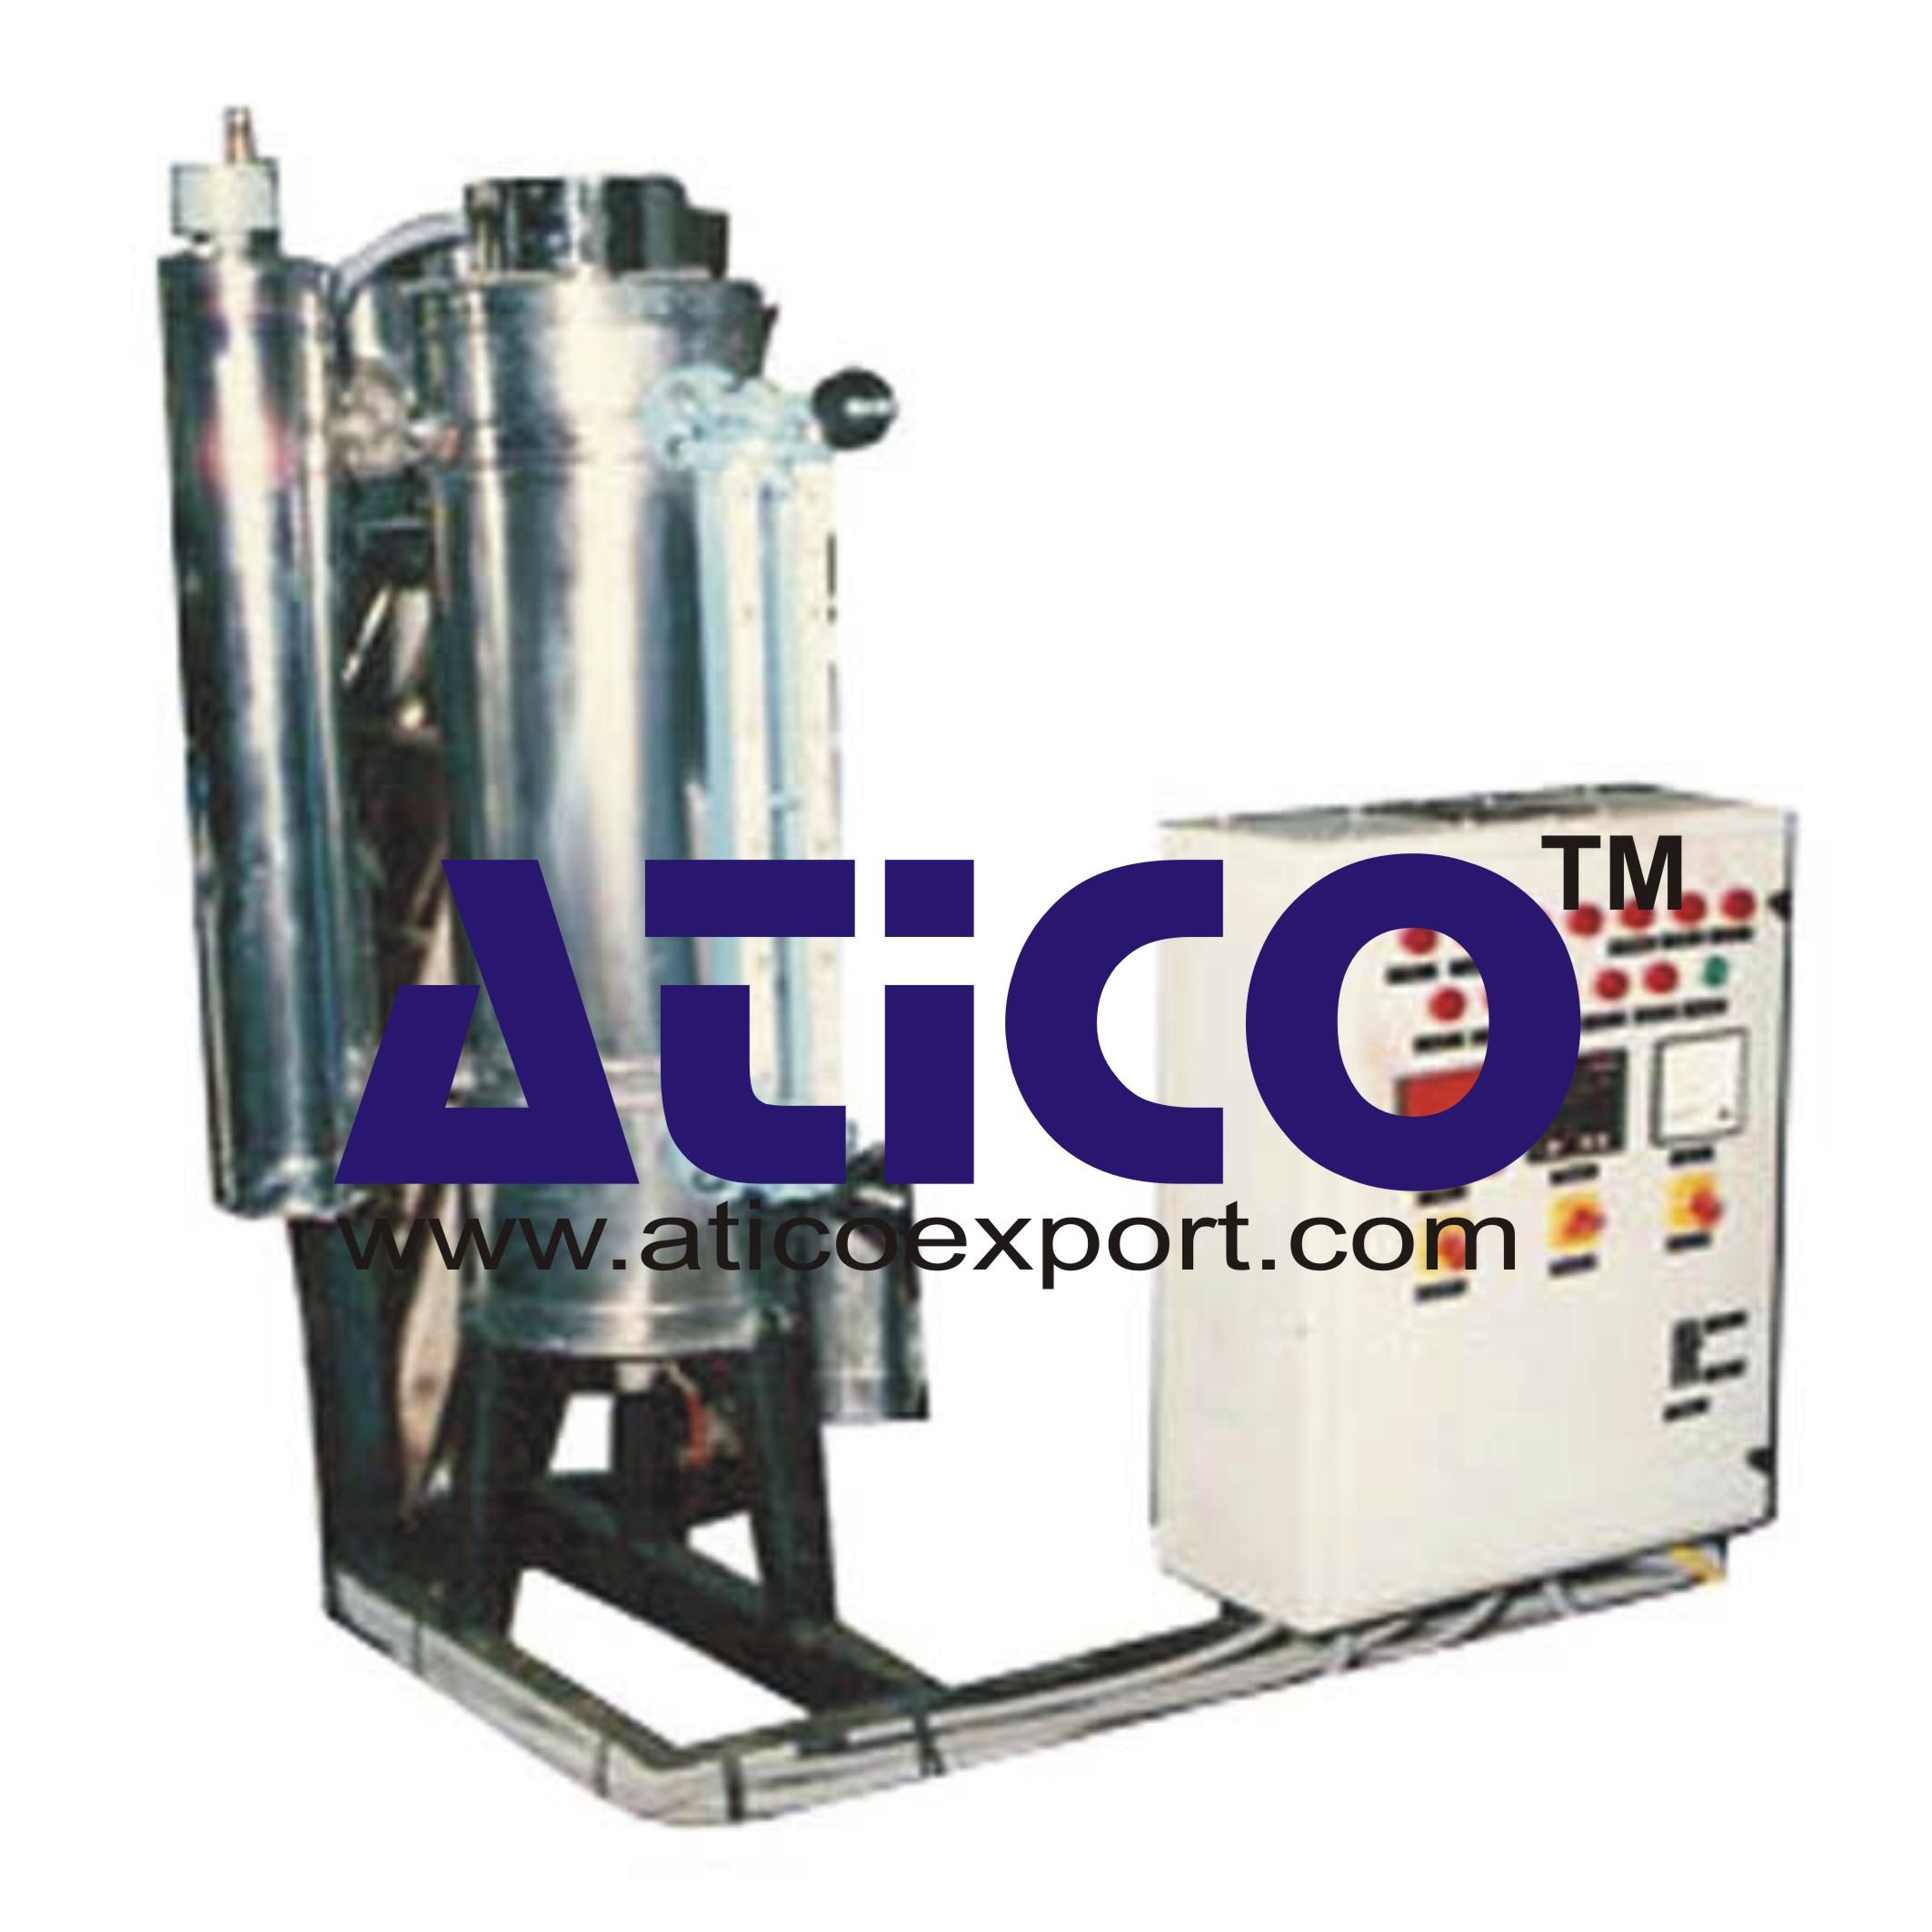 Laboratory Steam Generator Manufacturer Exporter and Supplier